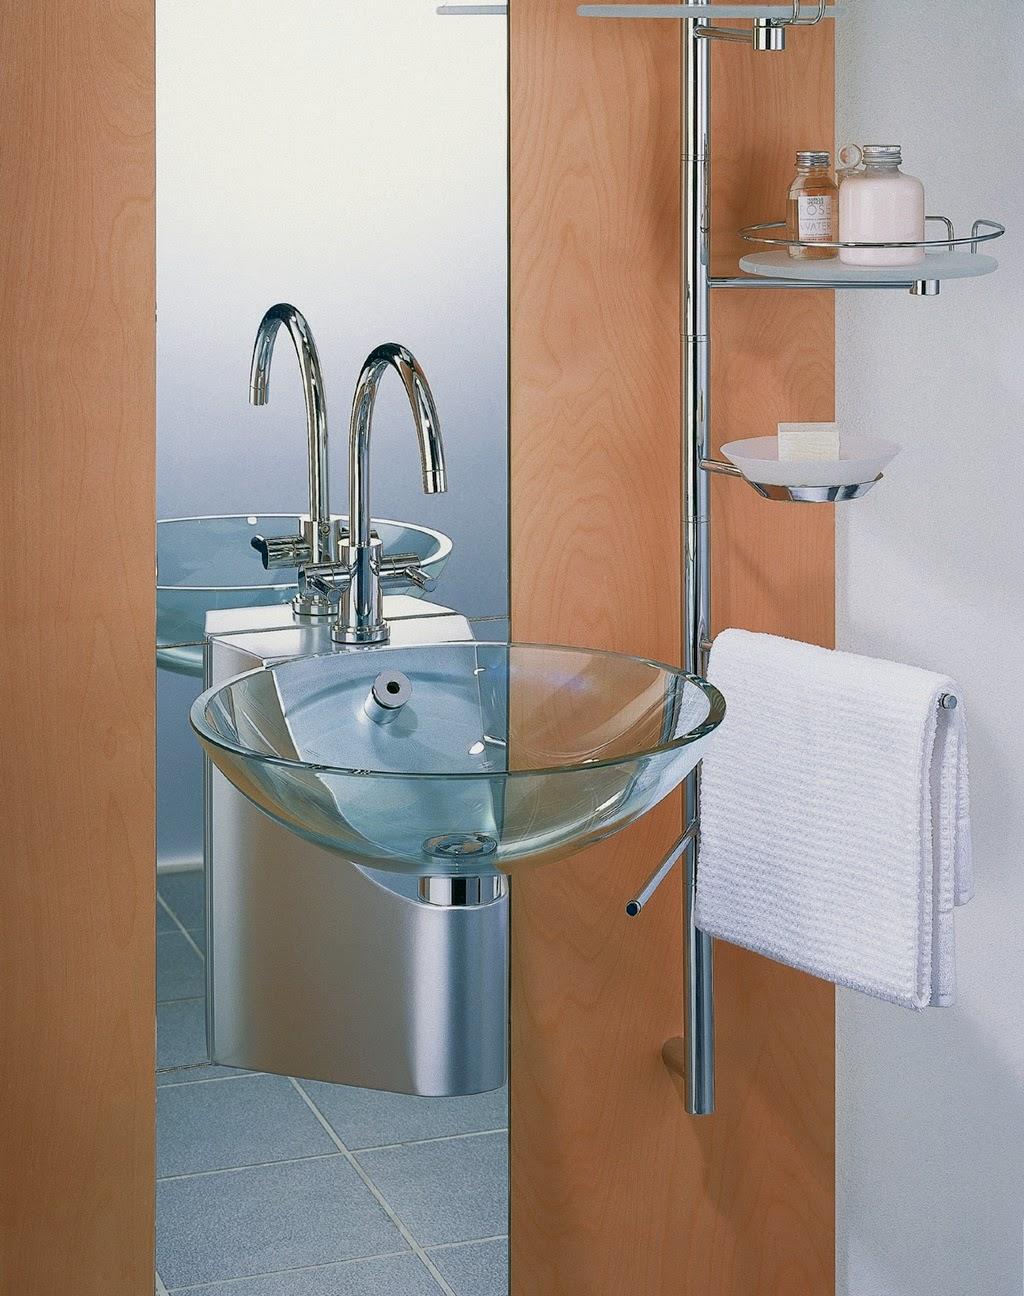 Design Bathroom Tiles Online Free | Home Decorating ...